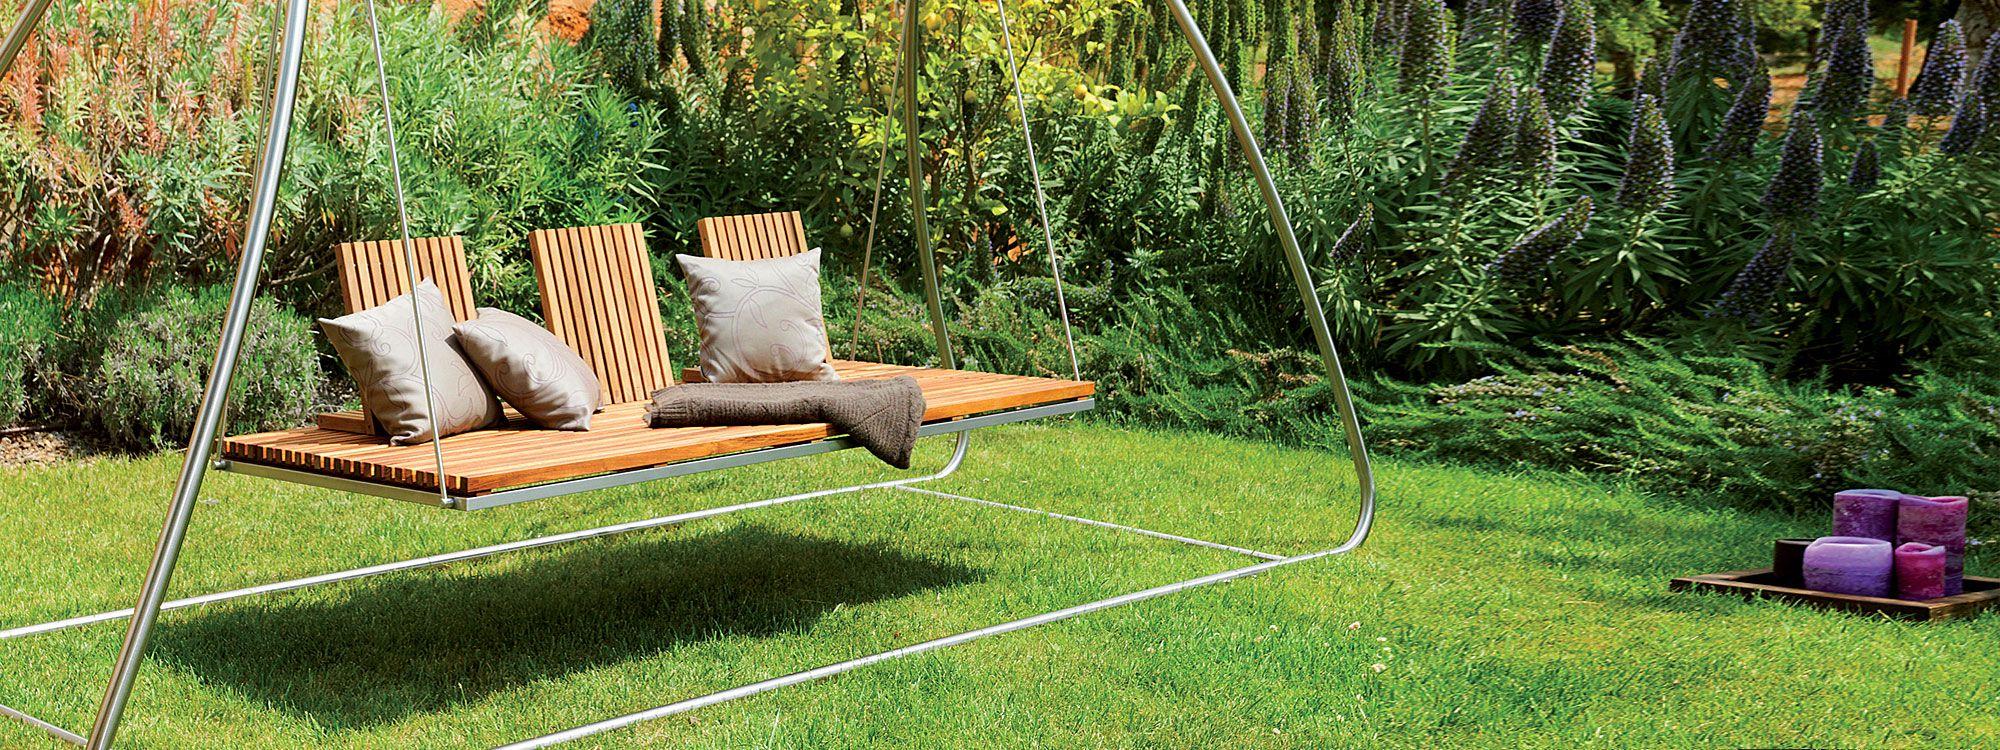 Home Modern Garden Swing Seat Viteo Minimalist Garden Furniture Garden Swing Seat Quality Garden Furniture Minimalist Garden